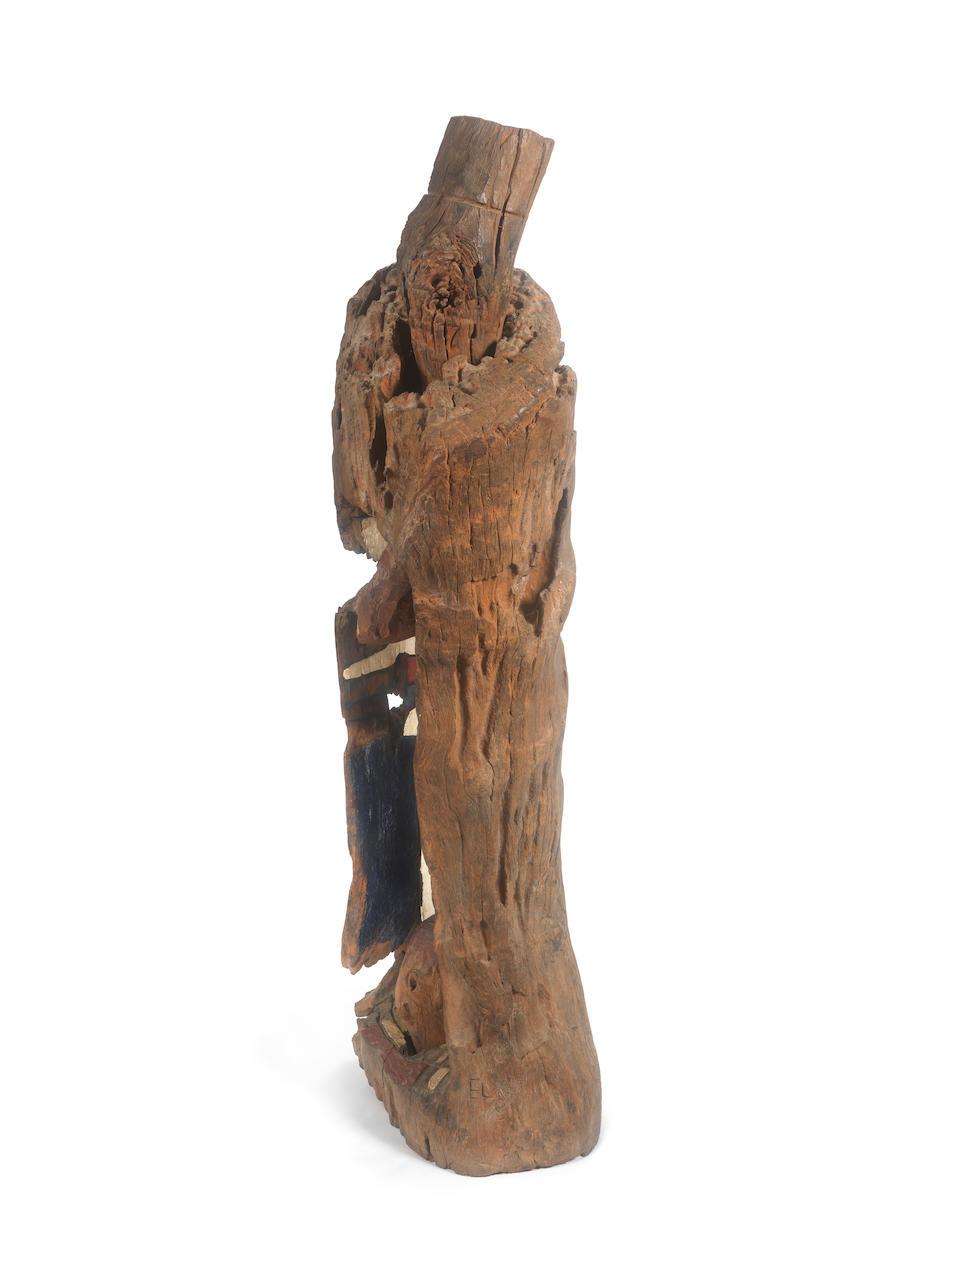 El Anatsui (Ghanaian, born 1944) 'Farmer's Dream' 120 x 50 x 40cm (47 1/4 x 19 11/16 x 15 3/4in).